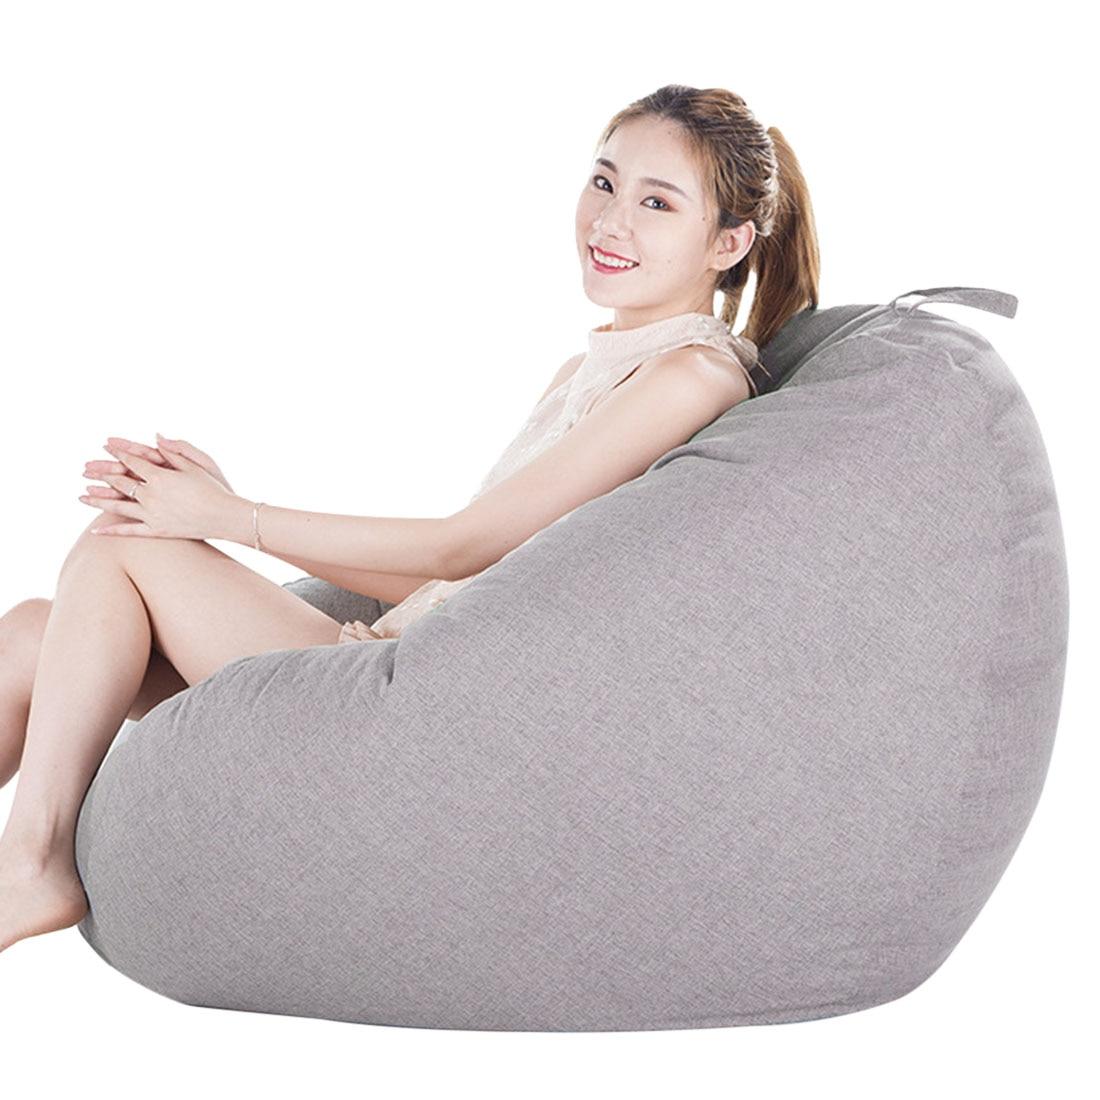 Bean Bag Sofas for Kid Adult Living Room Lazy Sofa Chair Children Bedroom Relax Lounger Bean